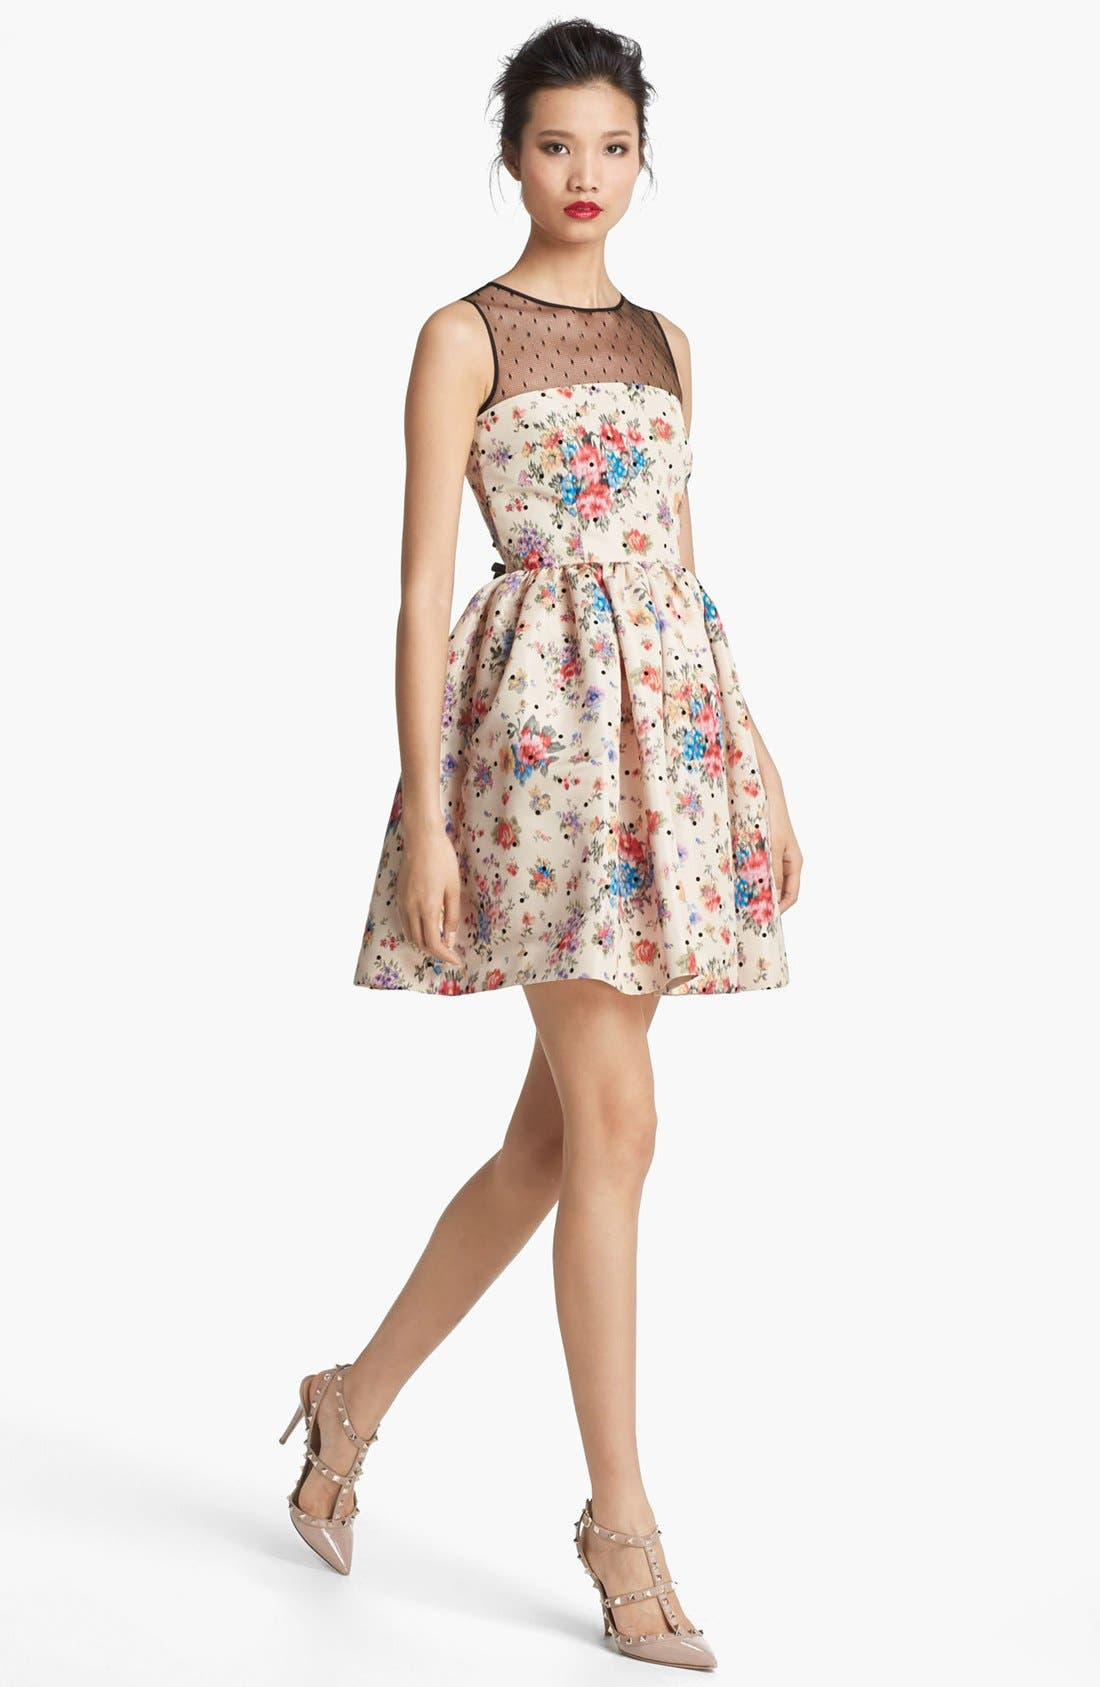 Alternate Image 1 Selected - RED Valentino Flower & Polka Dot Print Dress